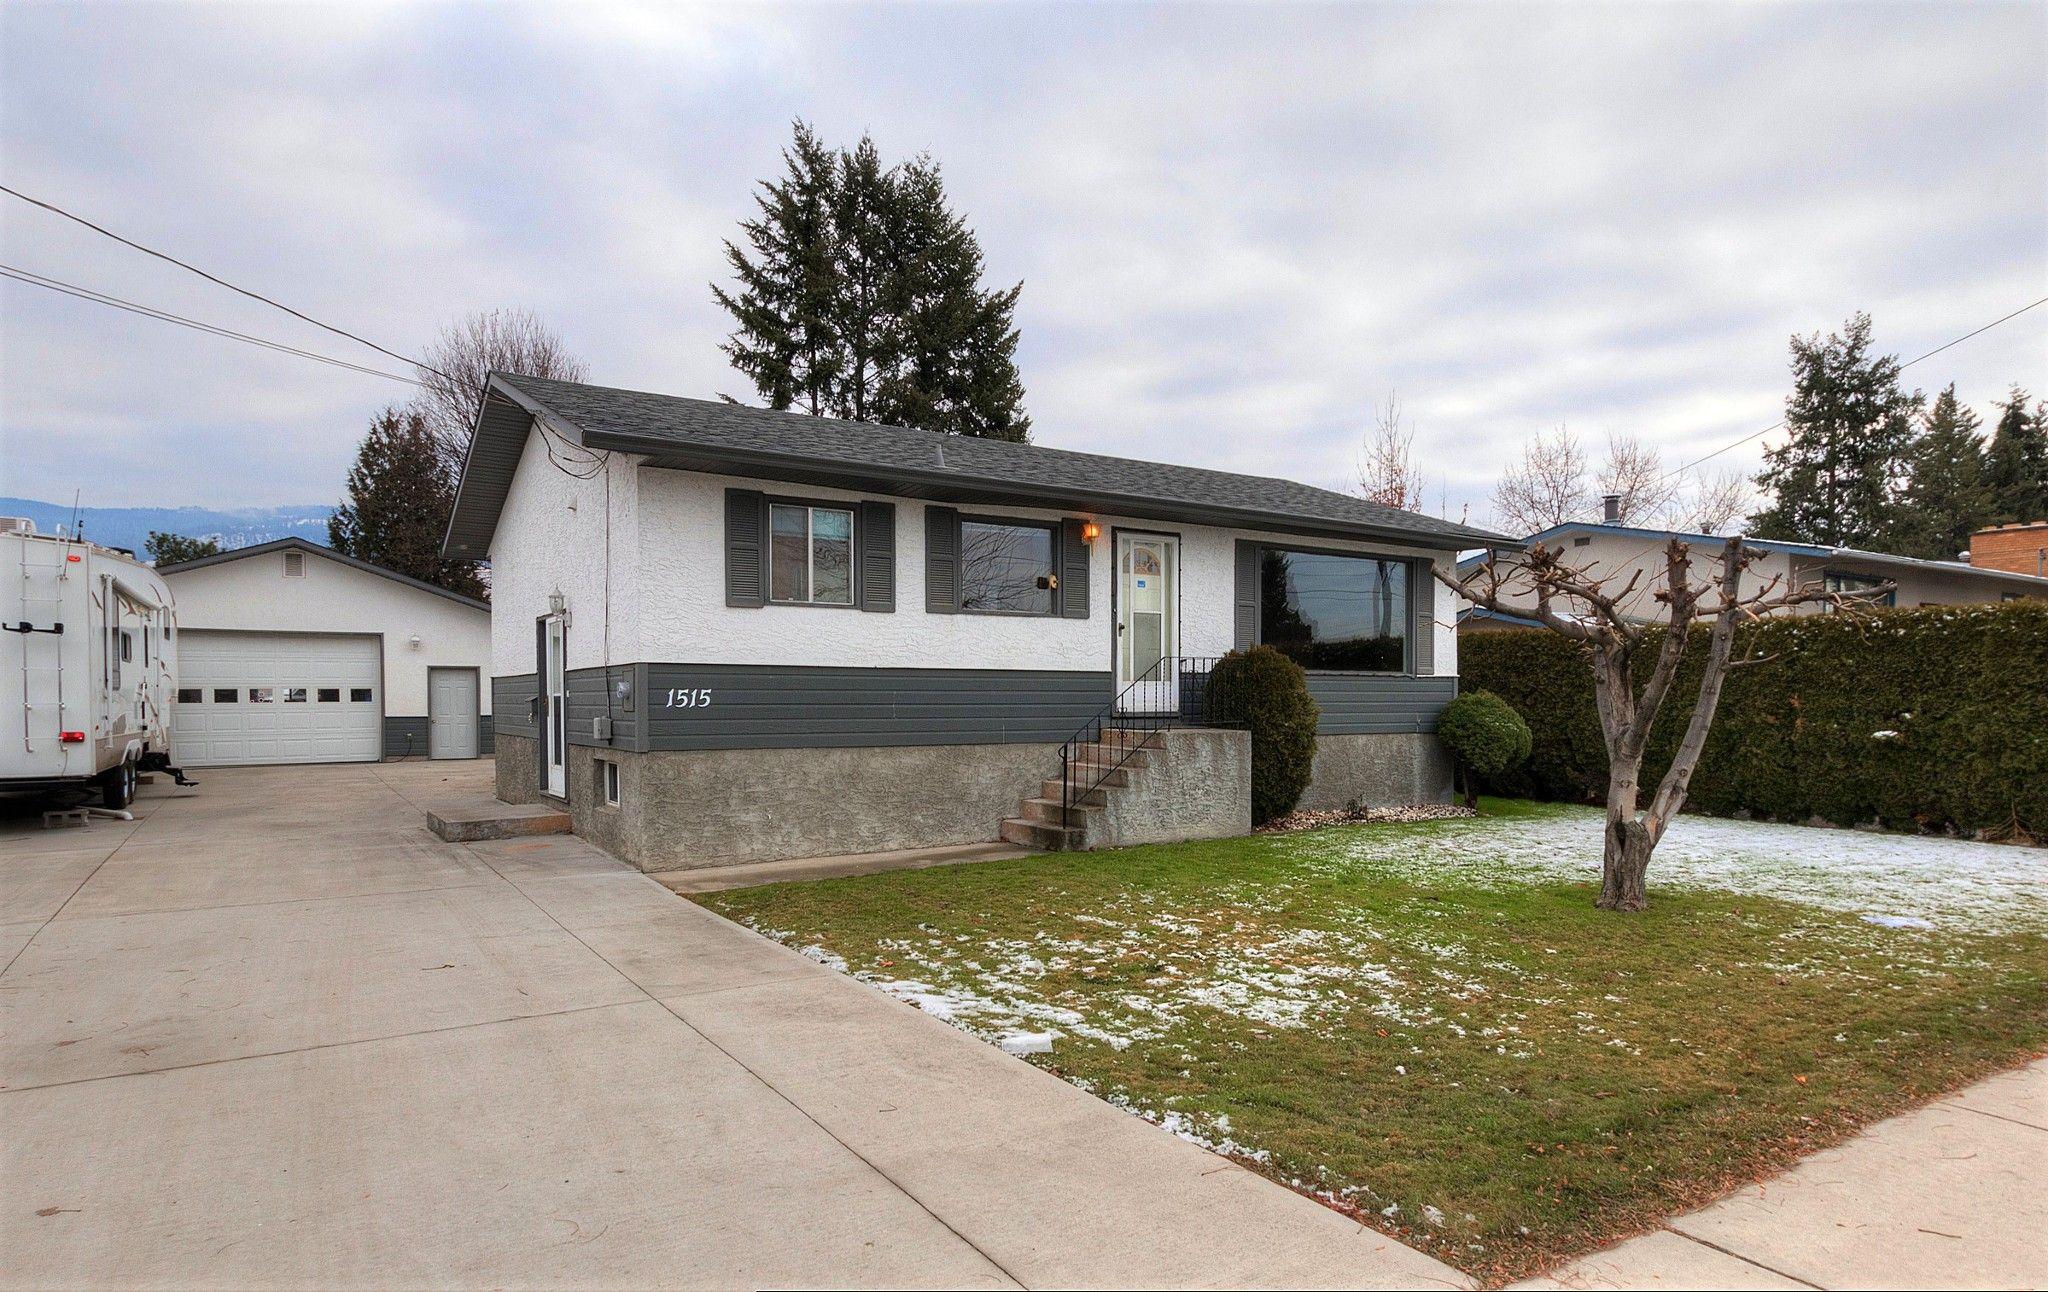 Main Photo: 1515 North Rutland Road in Kelowna: Rutland North House for sale (Central Okanagan)  : MLS®# 10146397